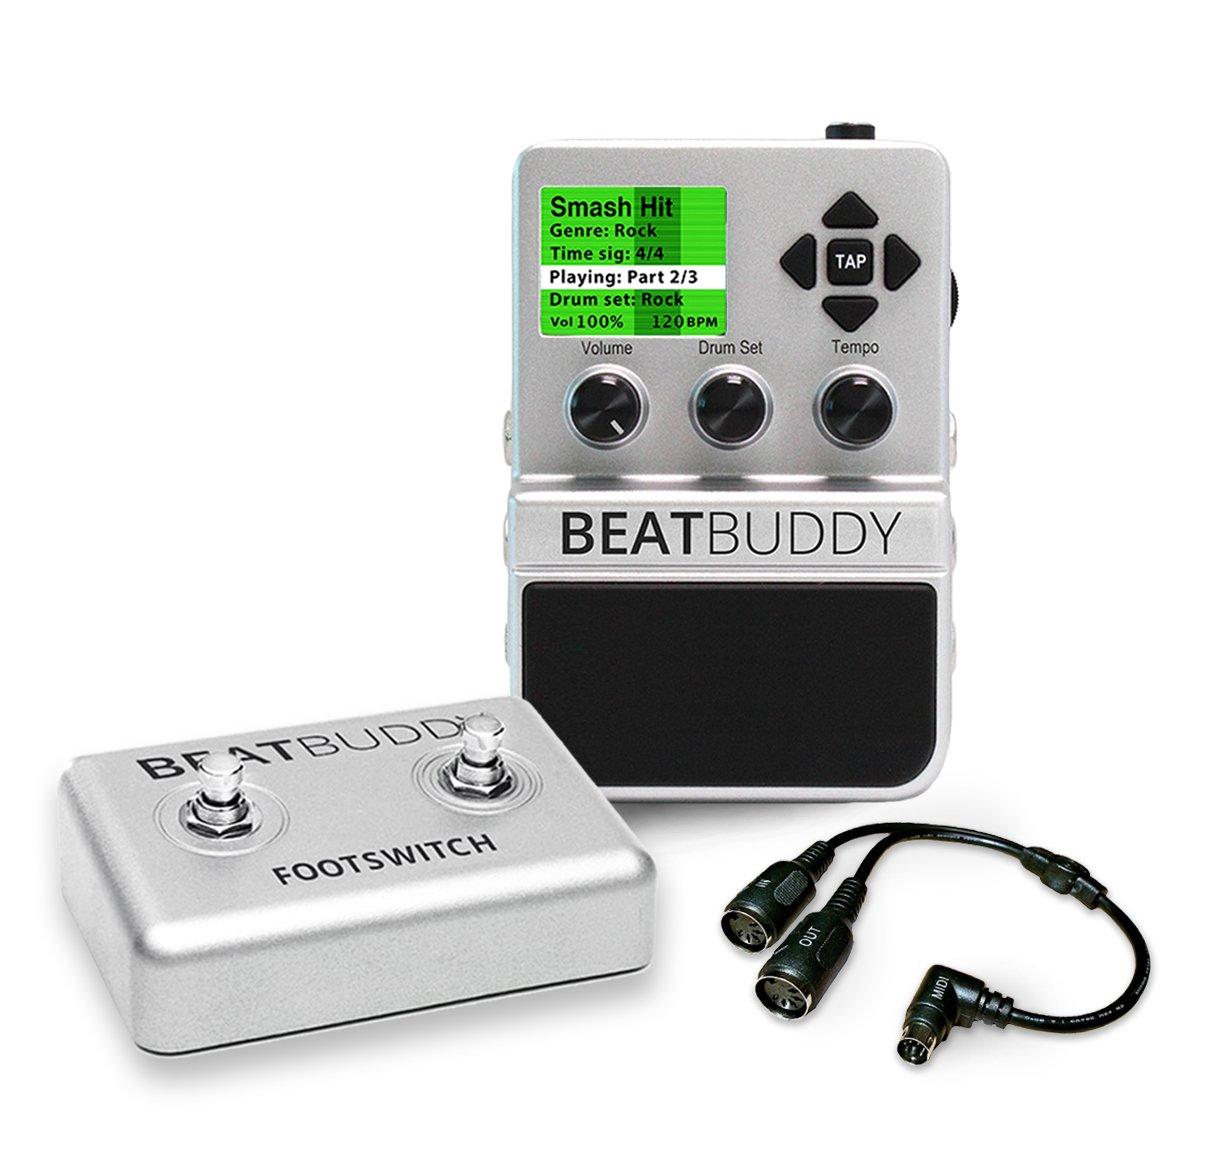 Singular Sound BeatBuddy Guitar Pedal Drum Machine + Footswitch + MIDI breakout cable BUNDLE